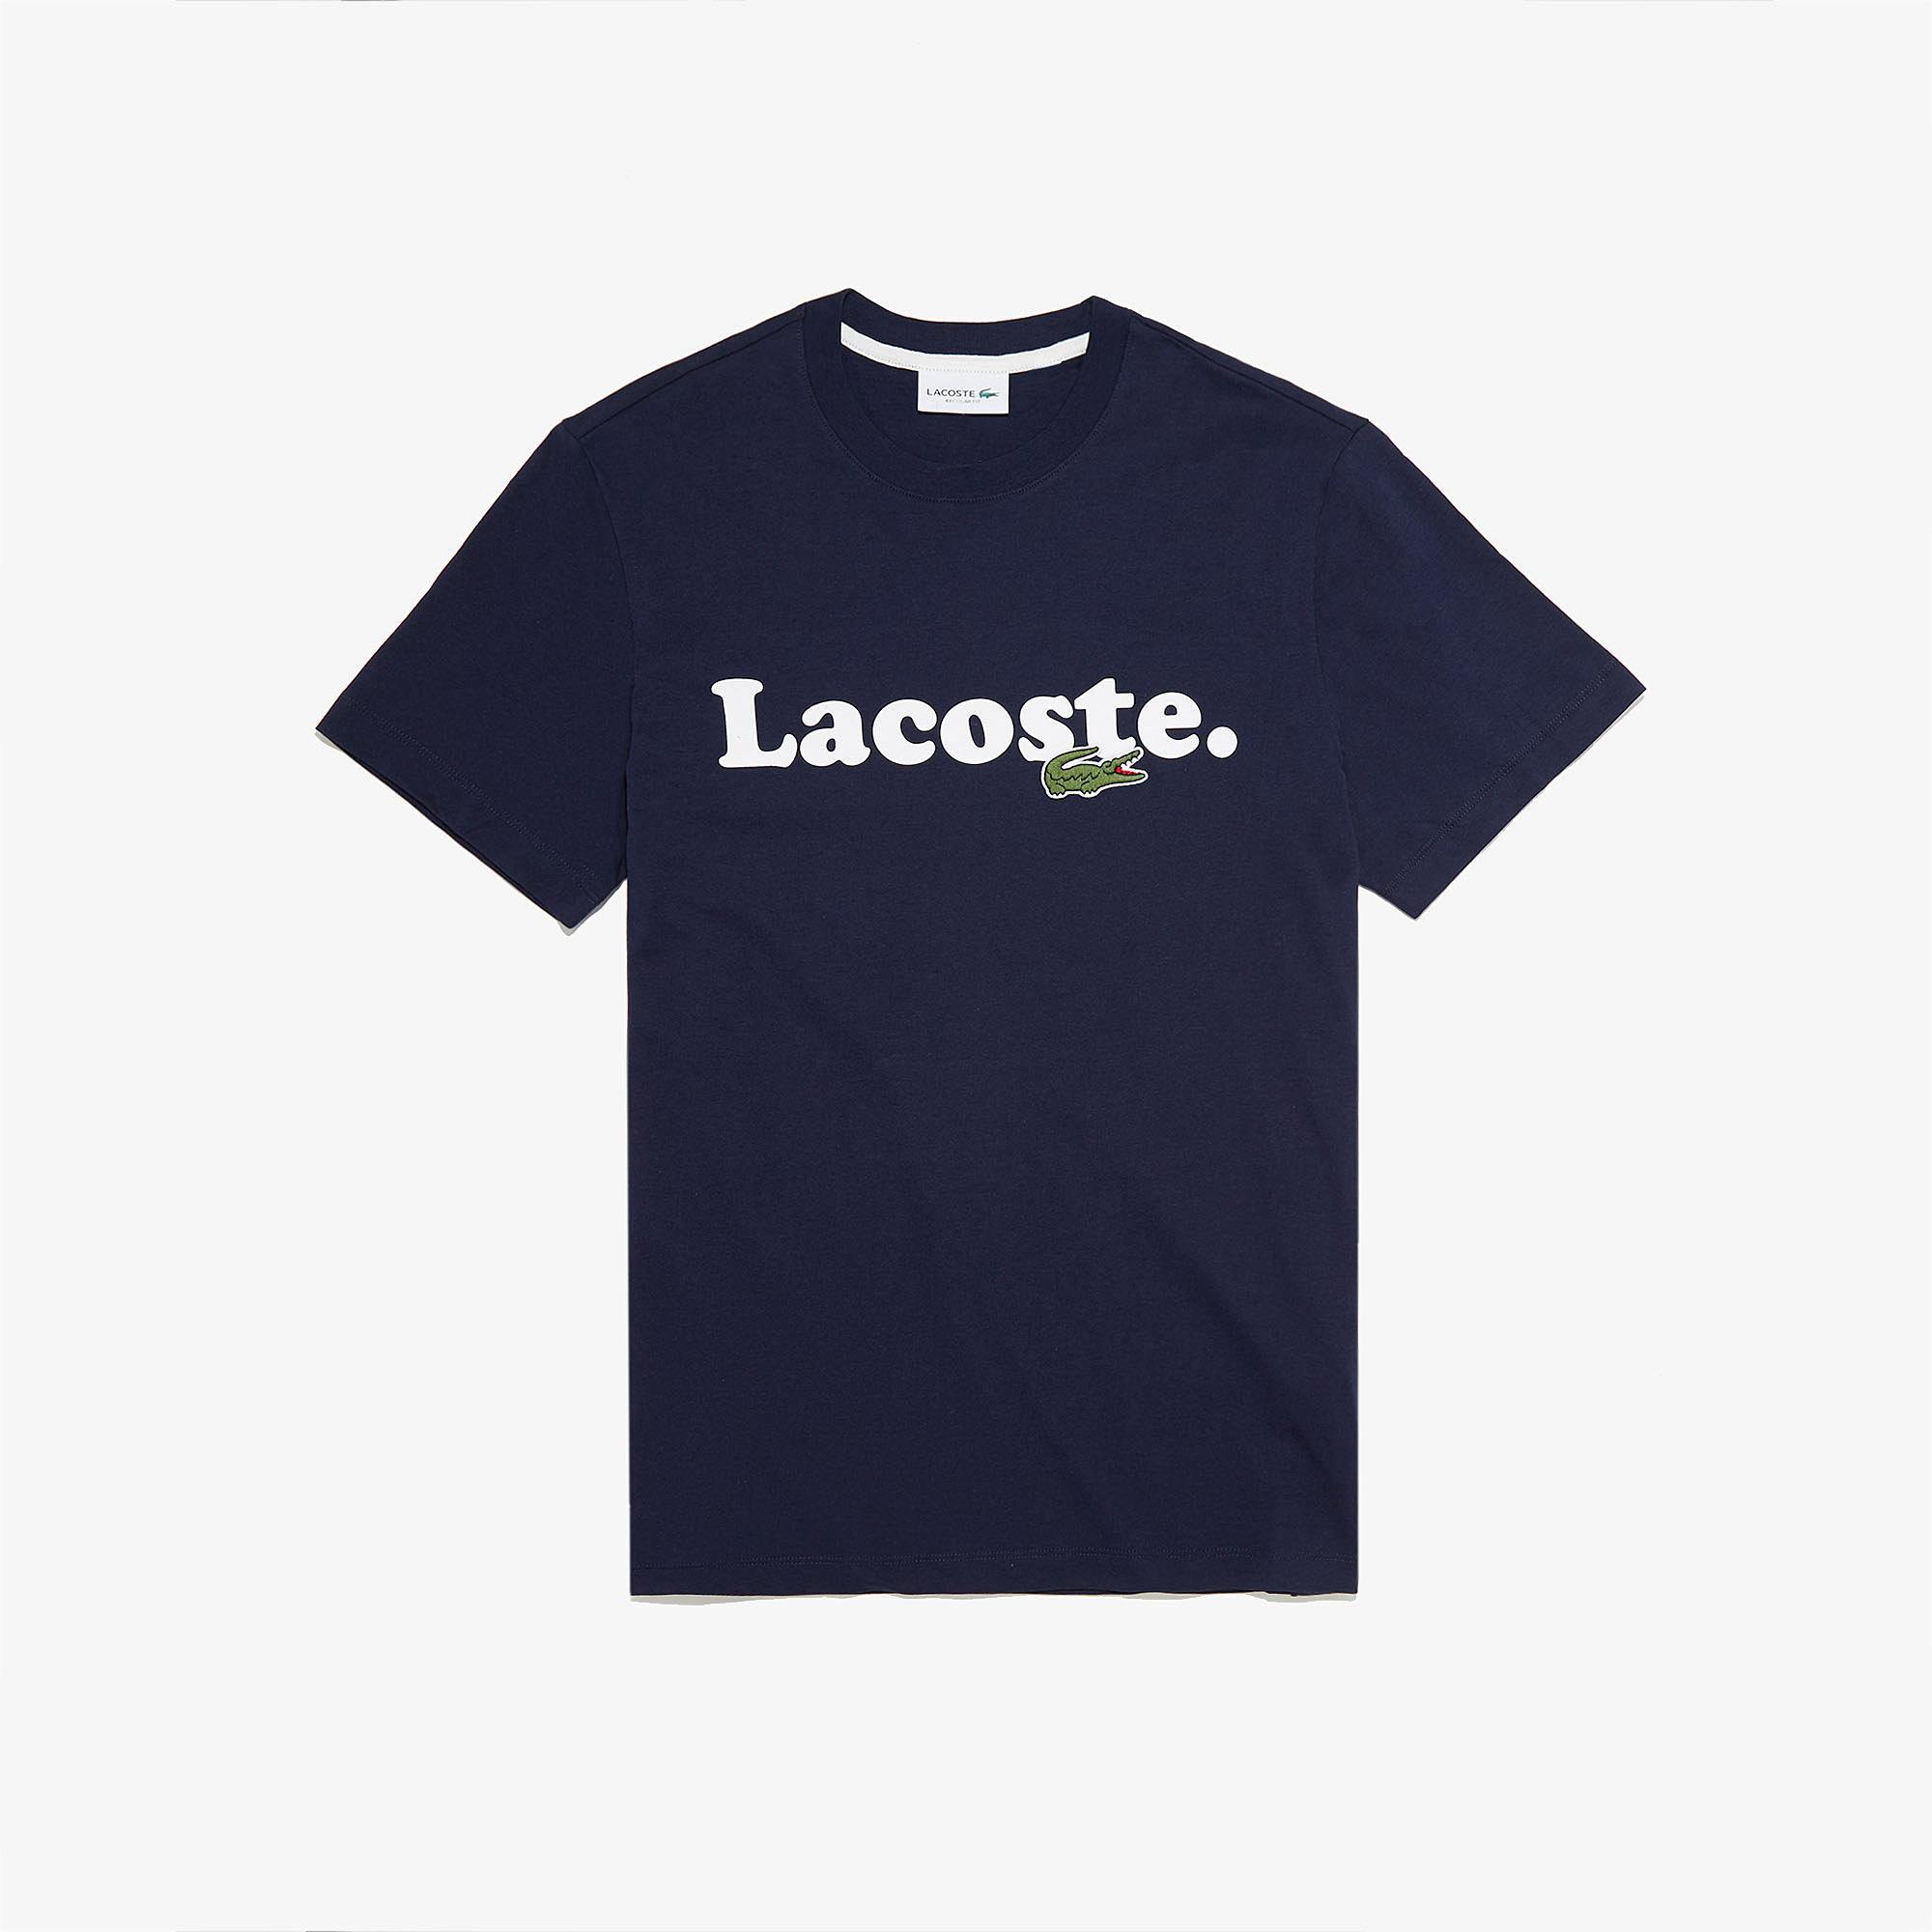 Lacoste Erkek Baskılı Bisiklet Yaka Lacivert T-Shirt